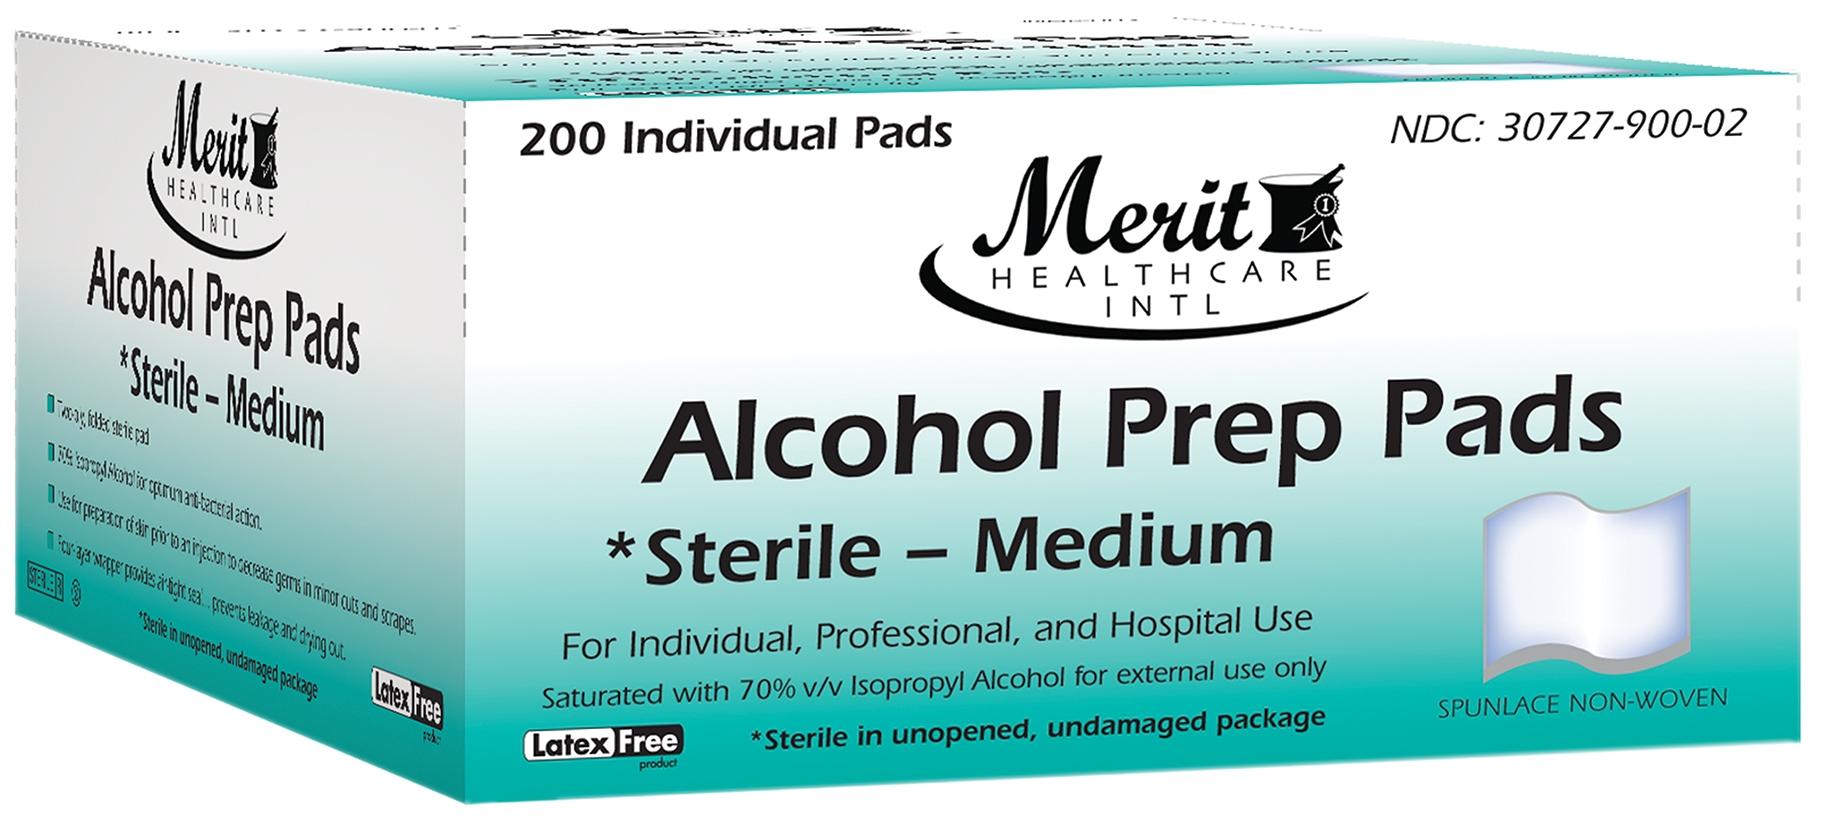 Alcohol Prep Pad, Isopropyl Alcohol, 70%, Individual Packet, Medium, Sterile, 200/BX